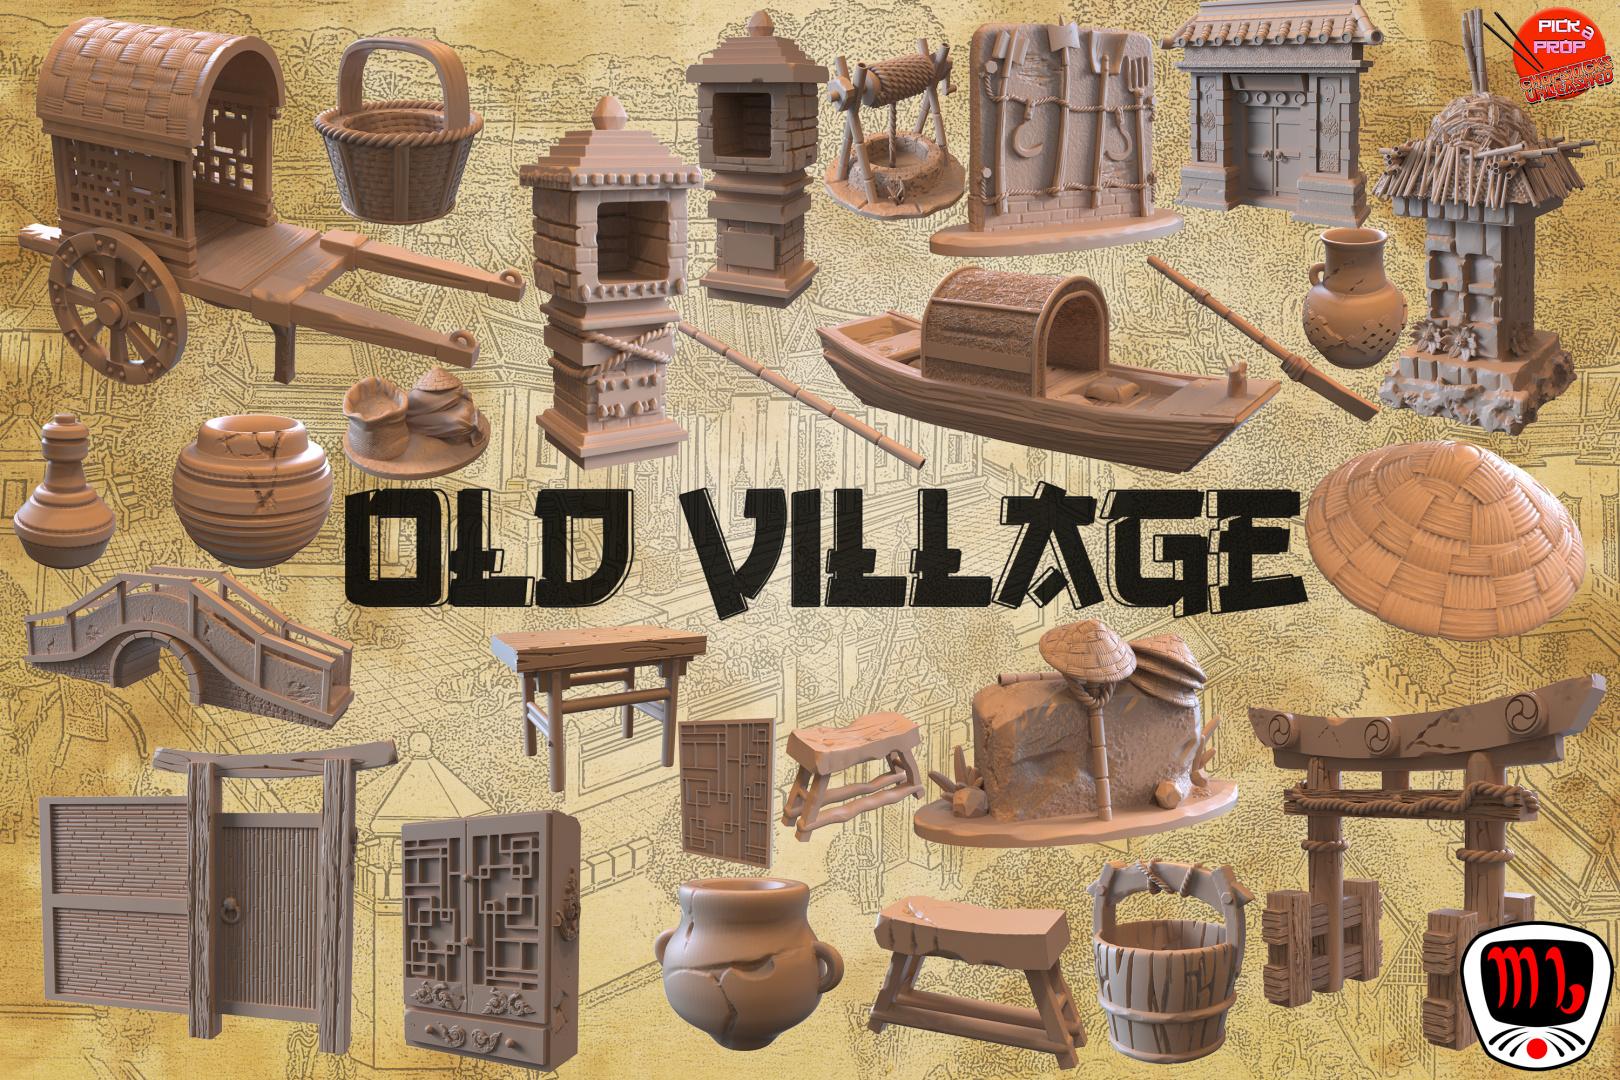 resize-oldvillage1.jpg